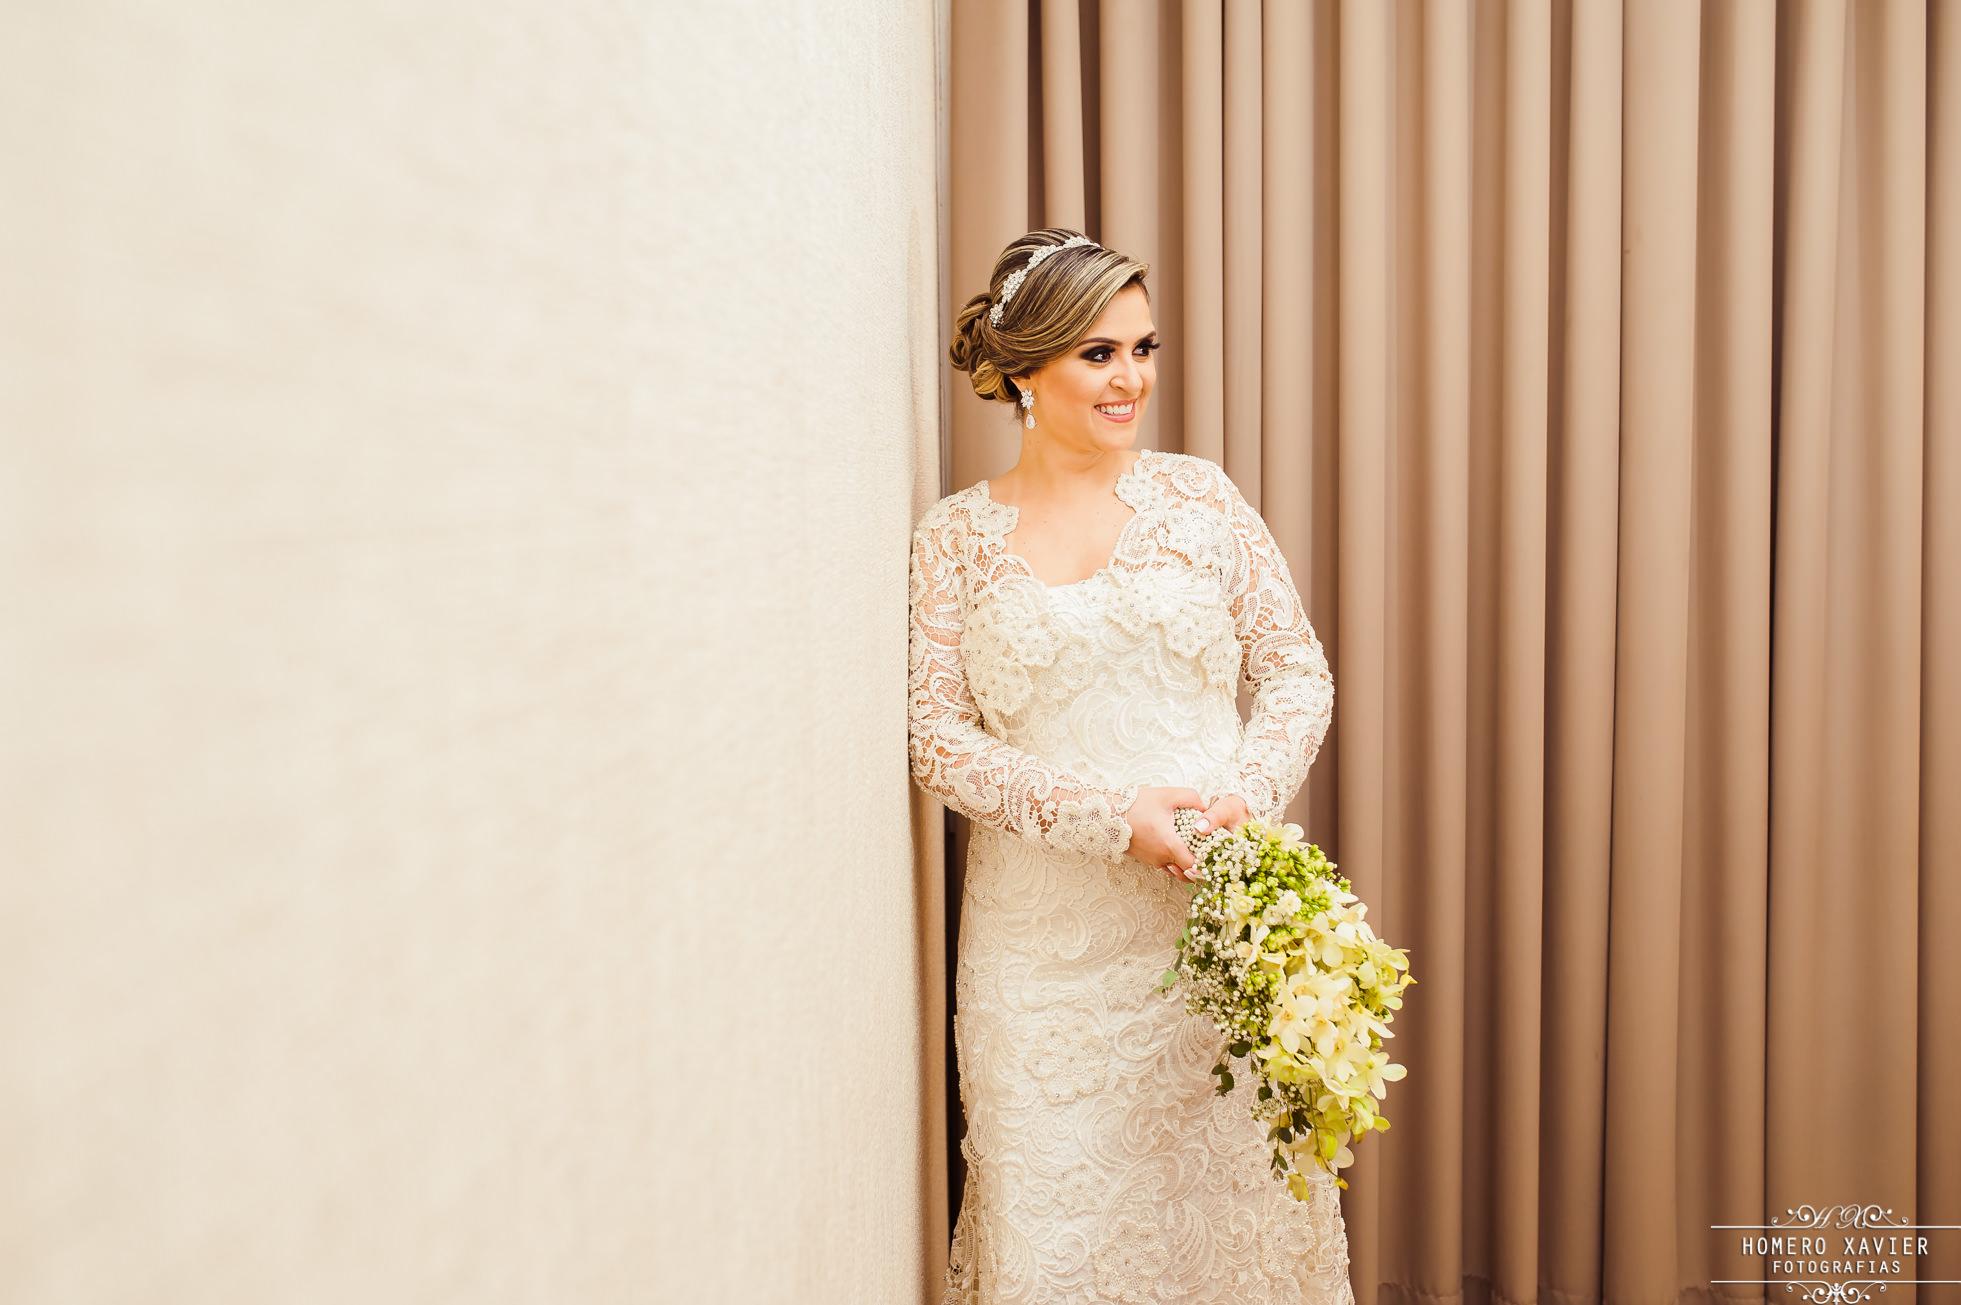 fotografia making off noiva Fernanda Bellone em BH